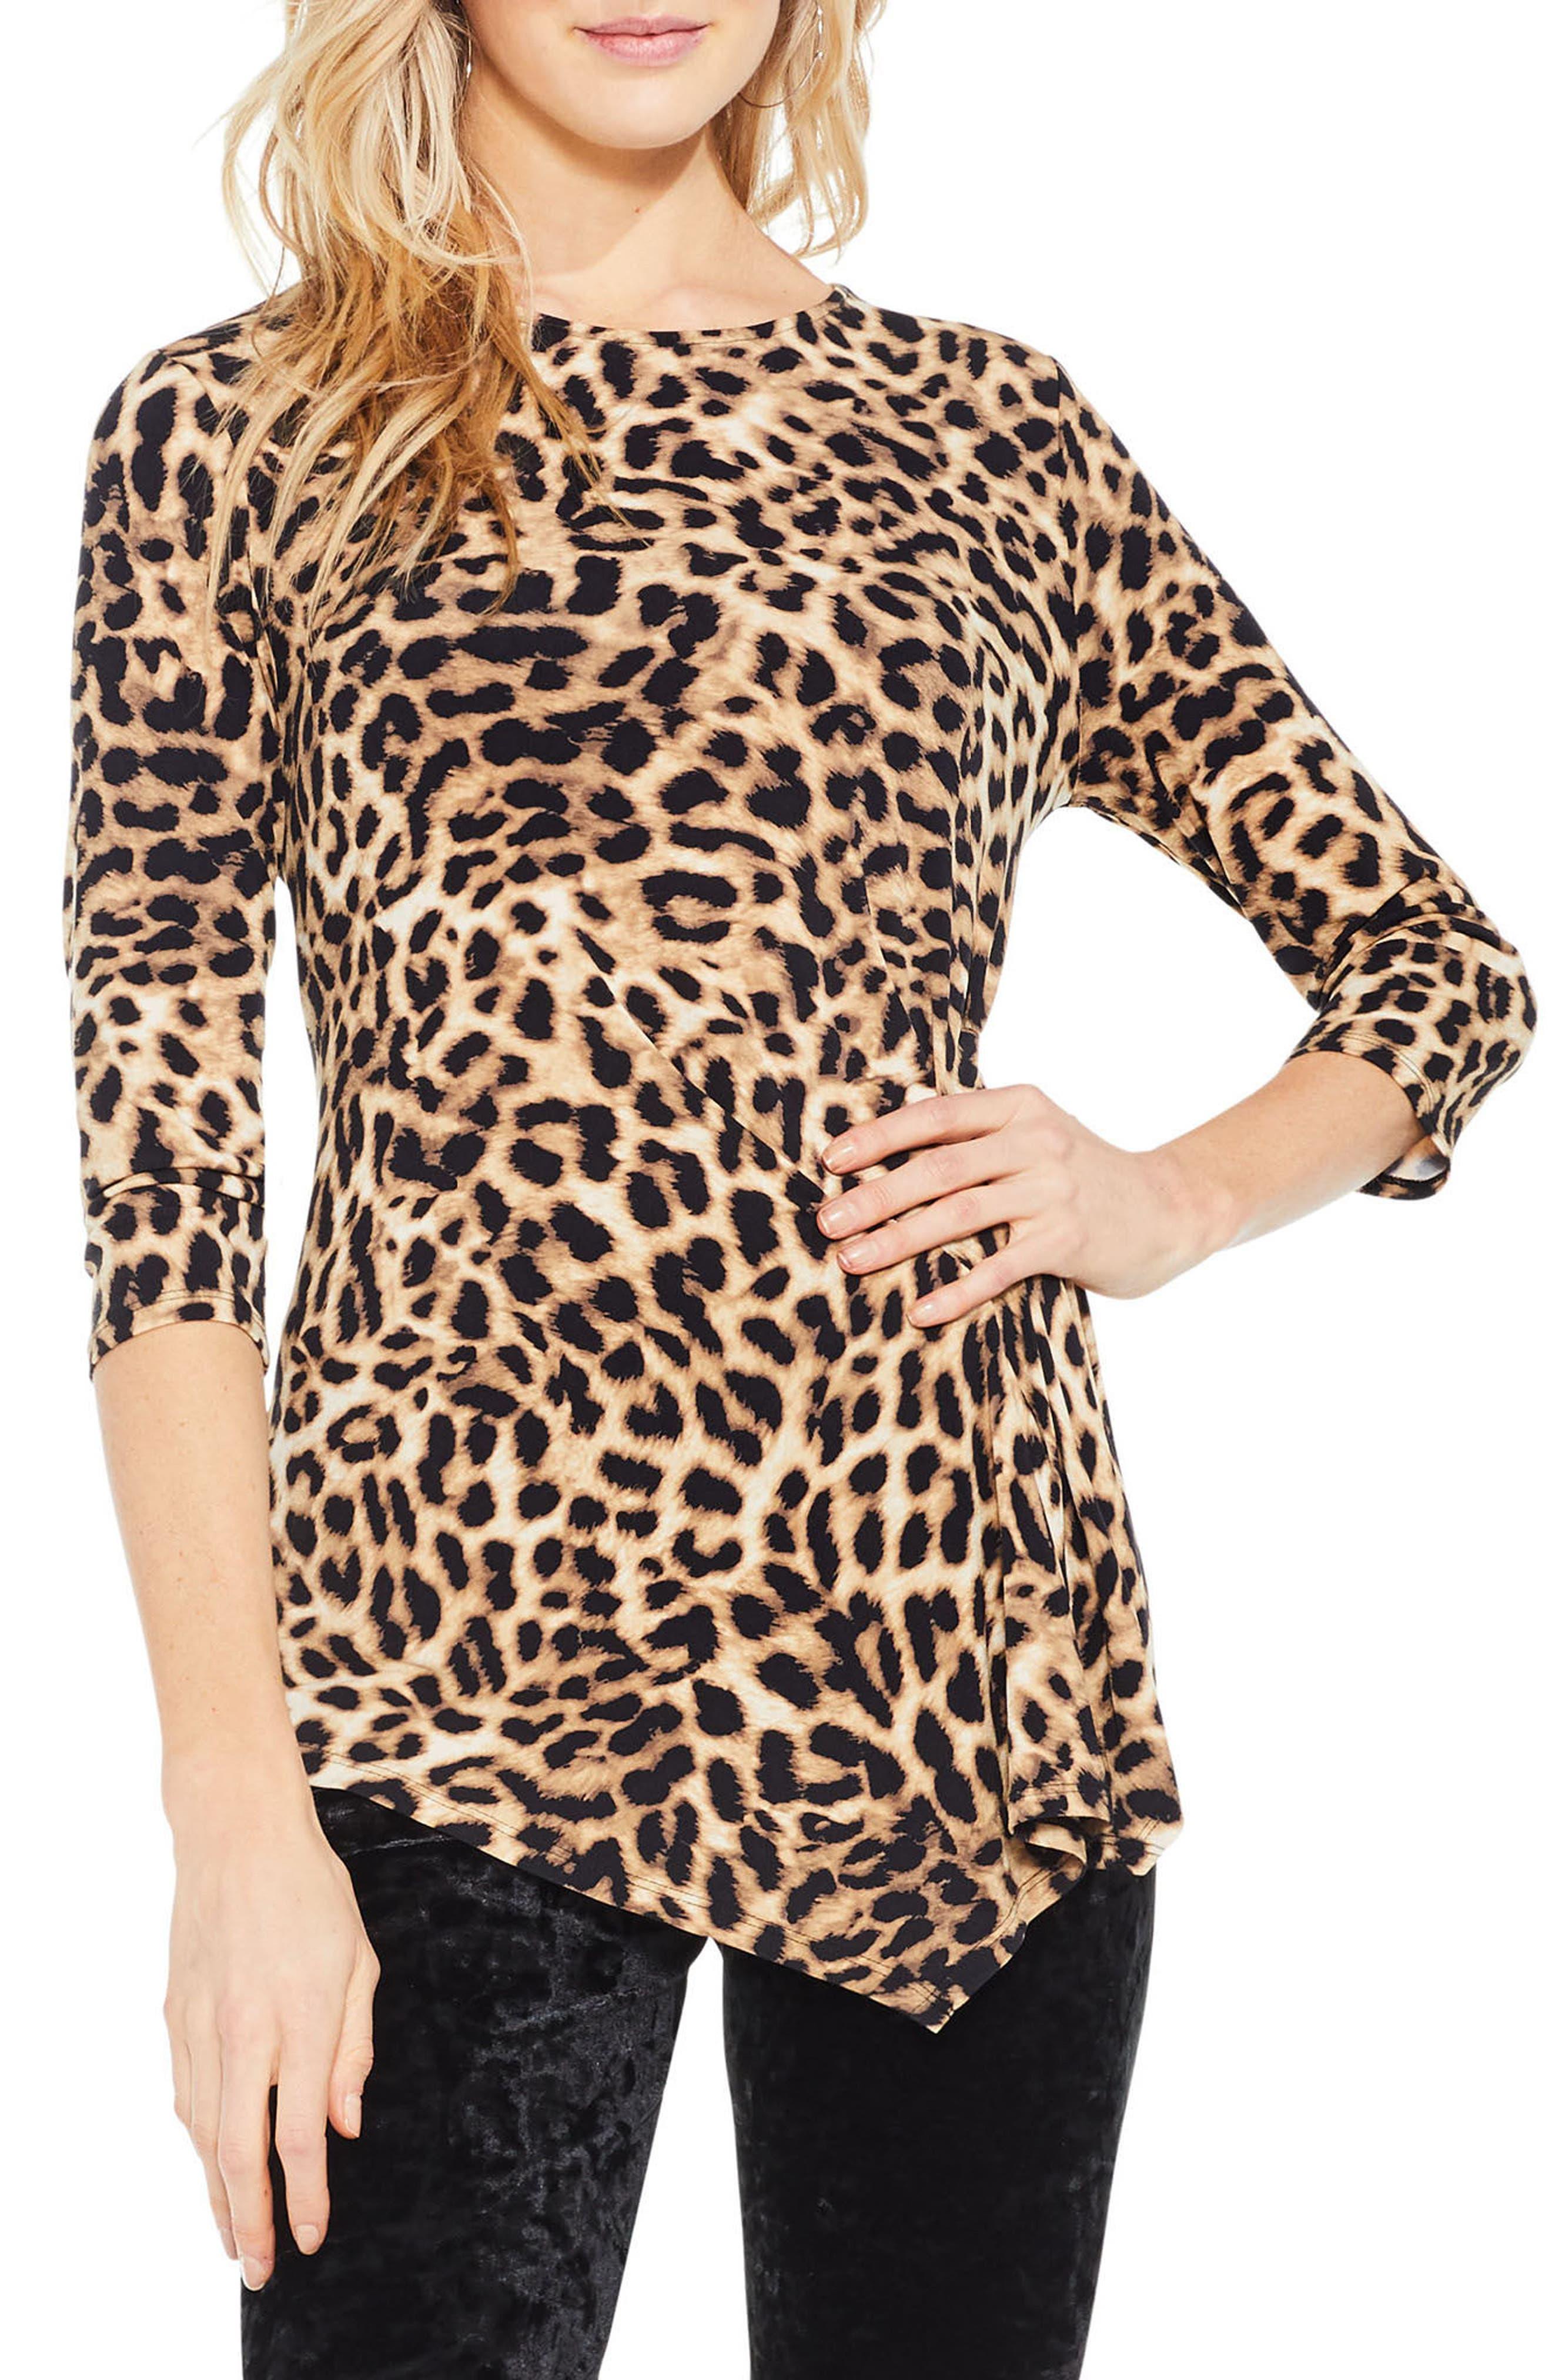 Main Image - Vince Camuto Leopard Print Asymmetrical Hem Top (Regular & Petite)